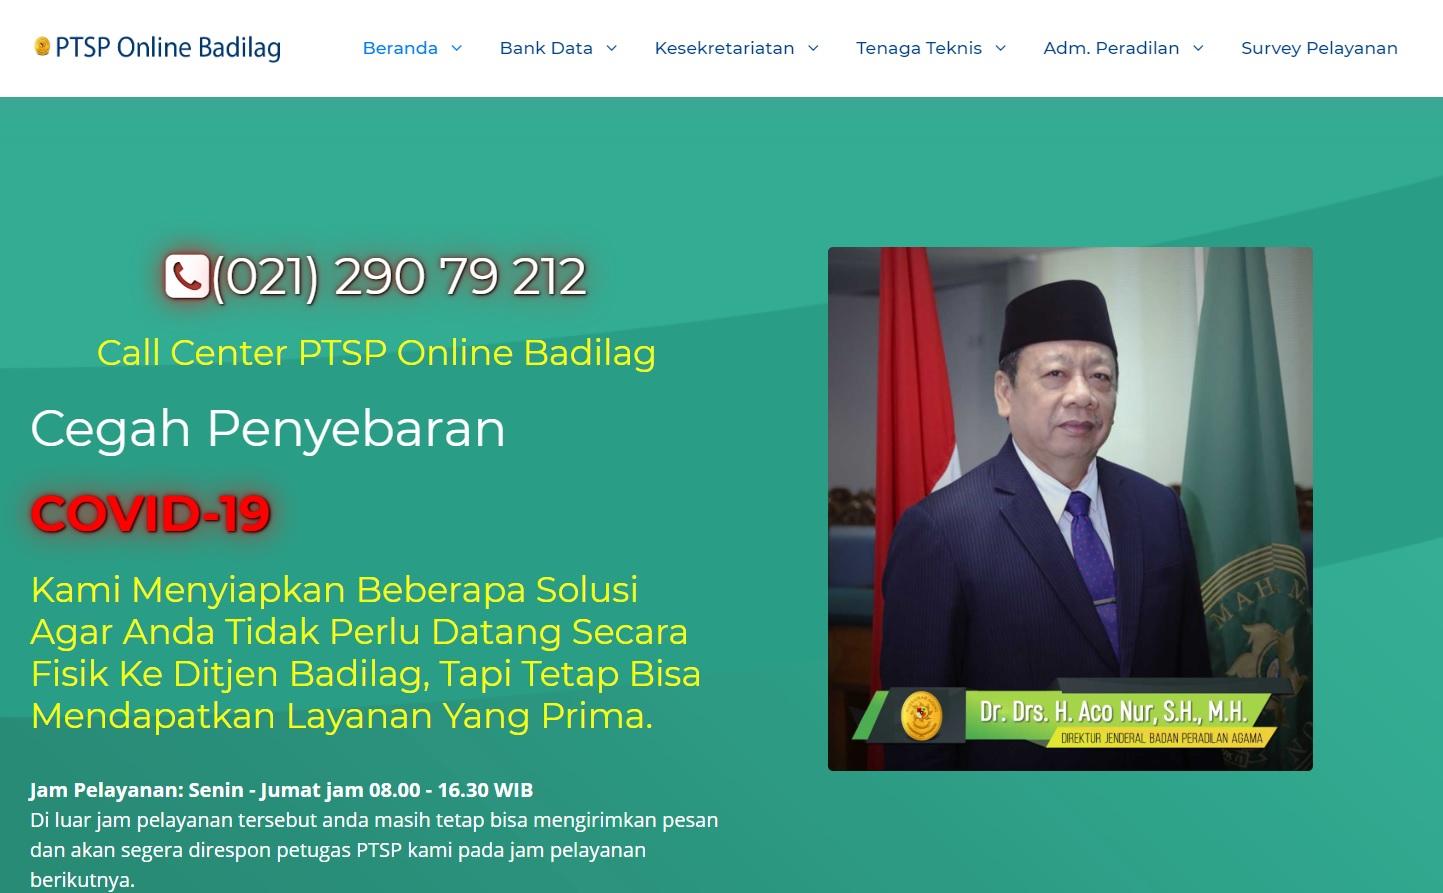 PTSP Online Badilag